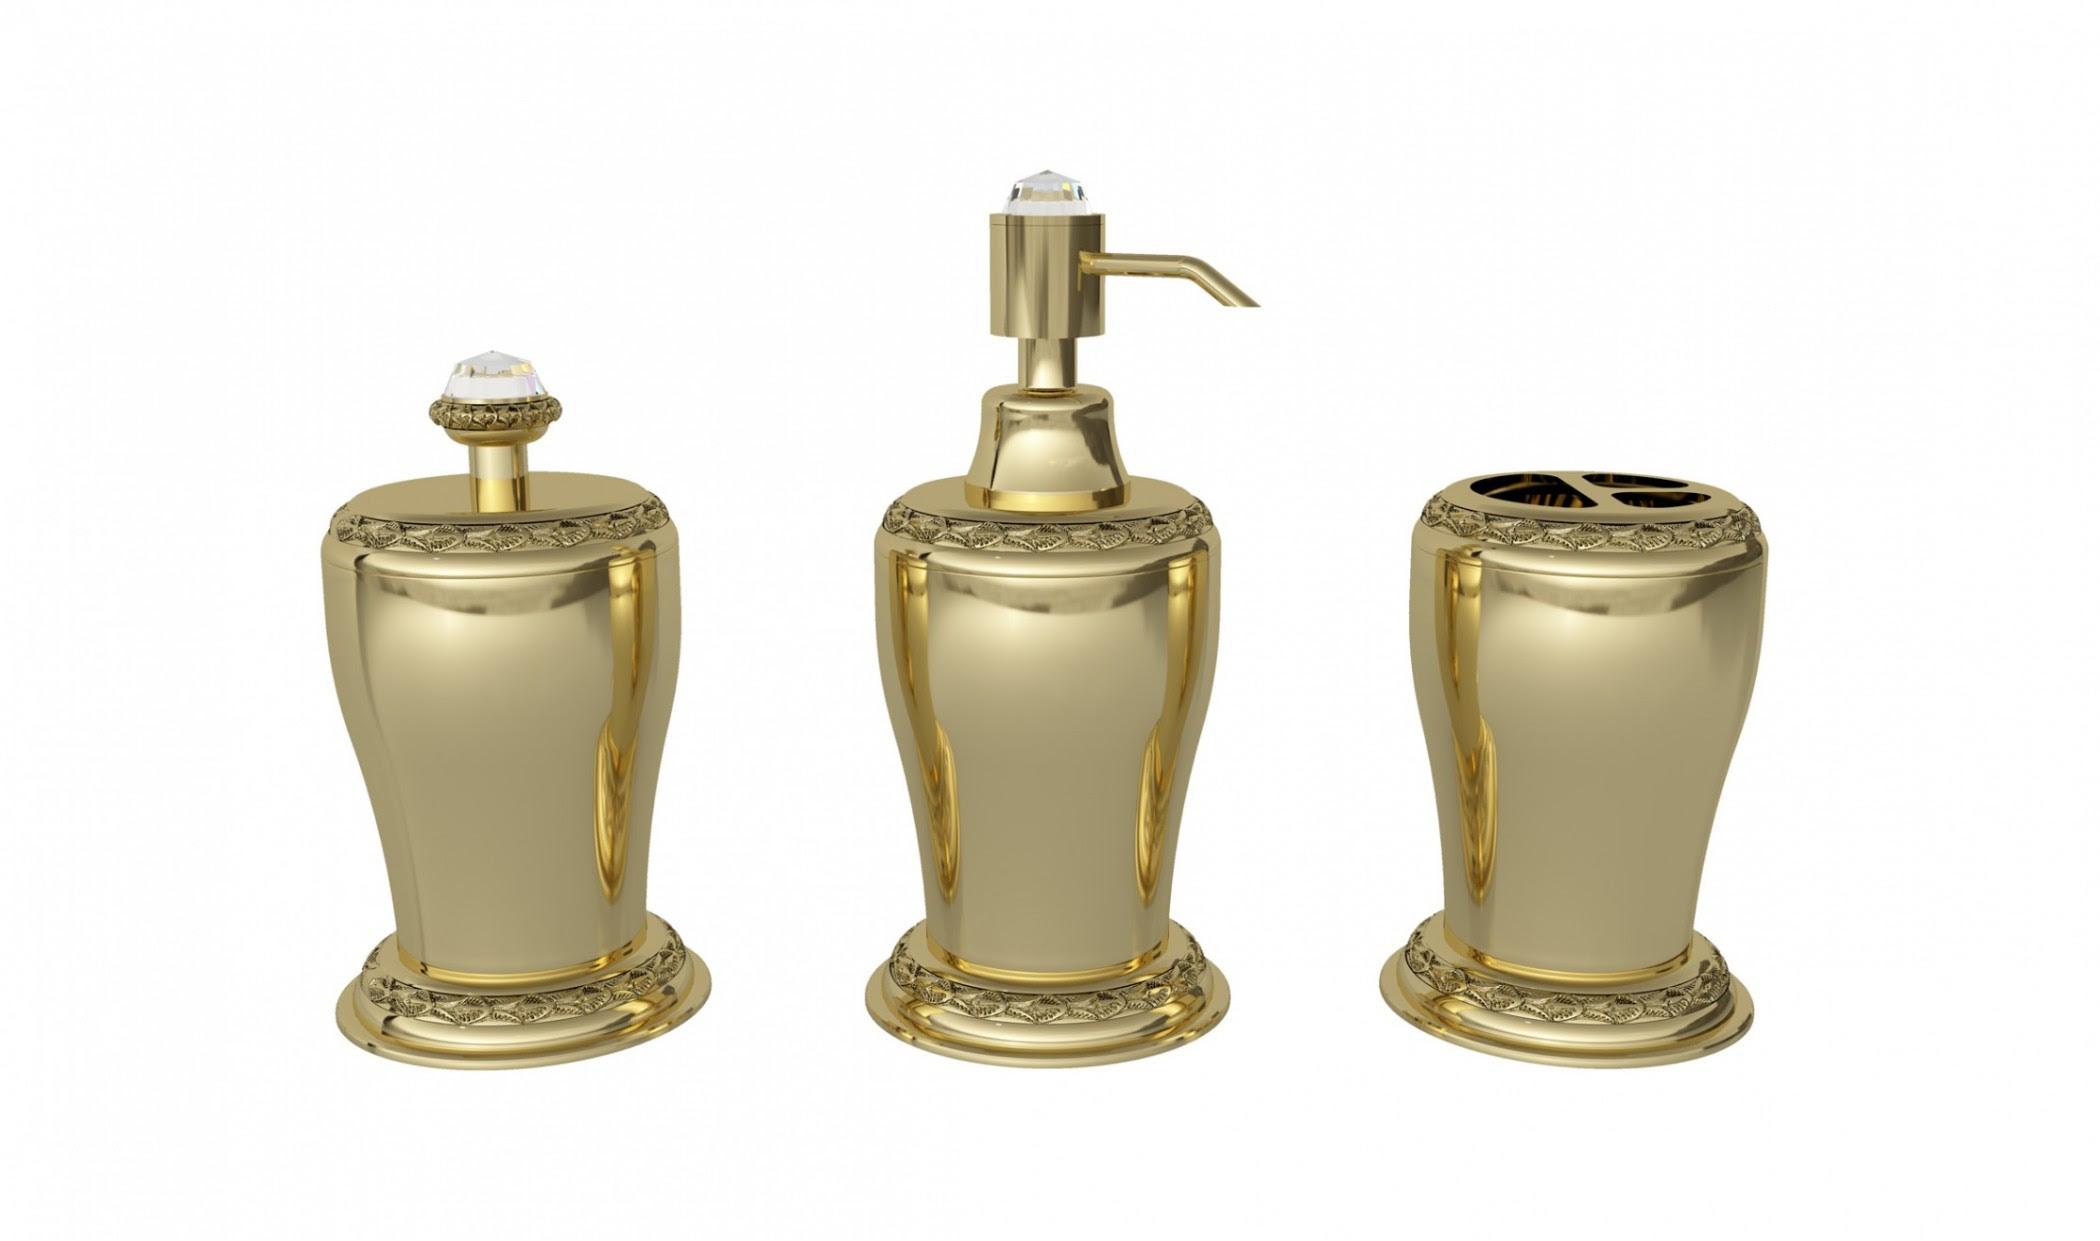 luxury bathroom accessories » Bronces Mestre